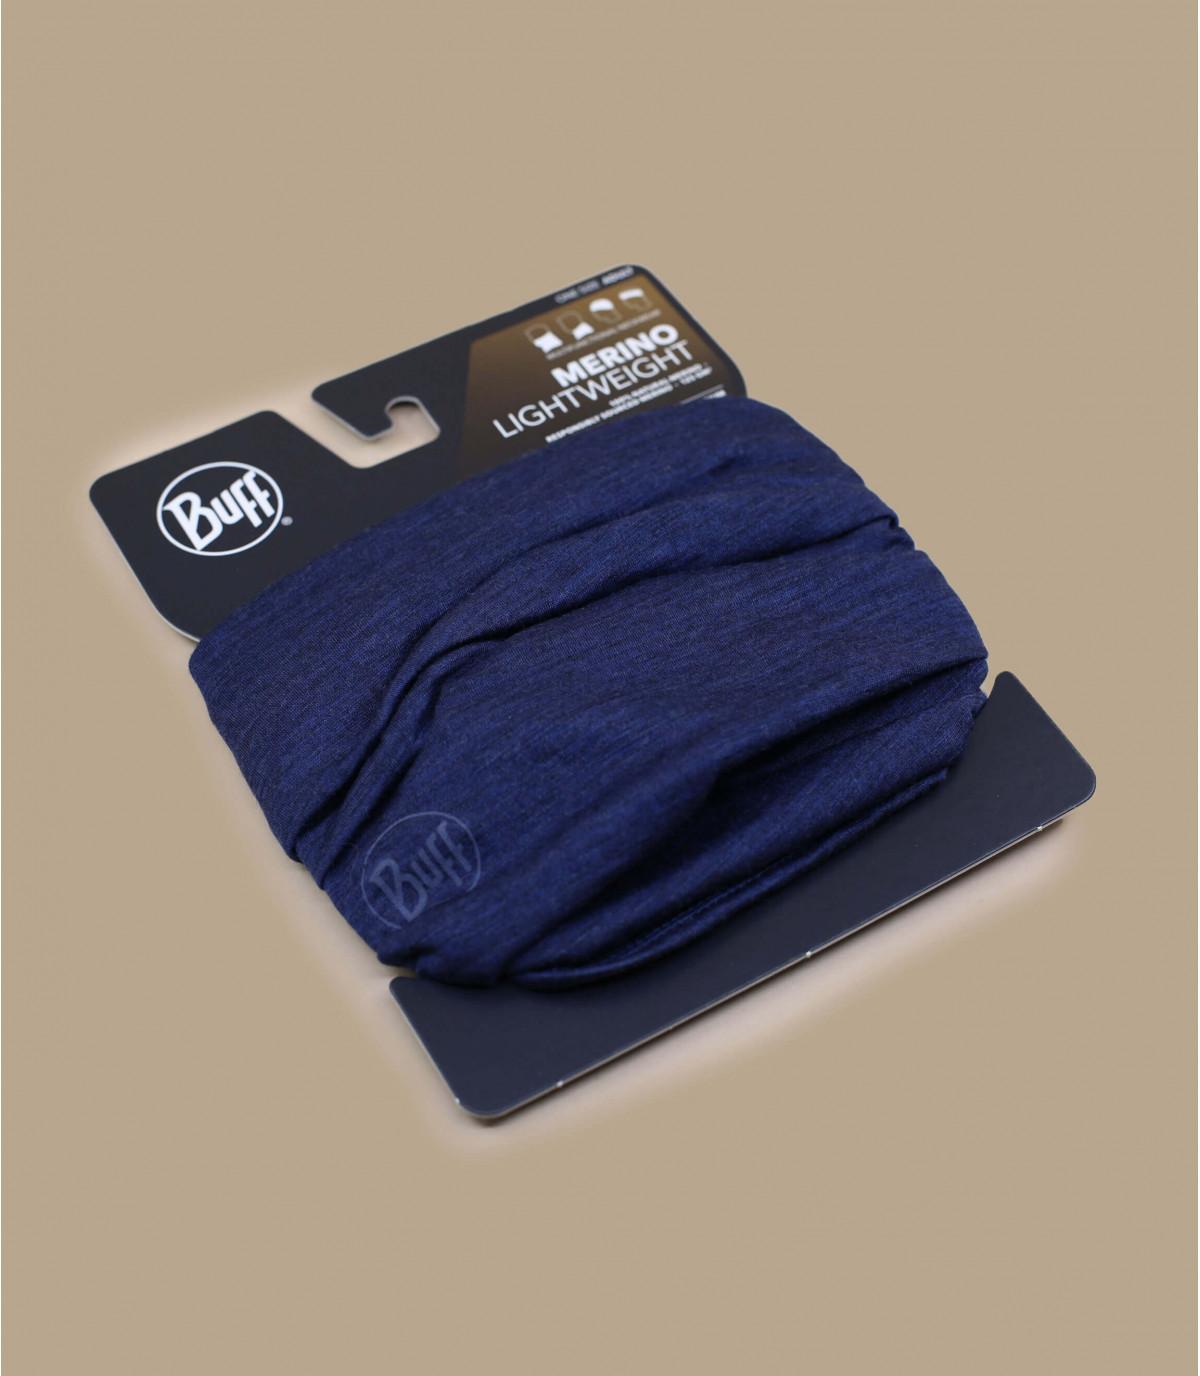 Details Lightweight Merino Wool solid denim - afbeeling 2